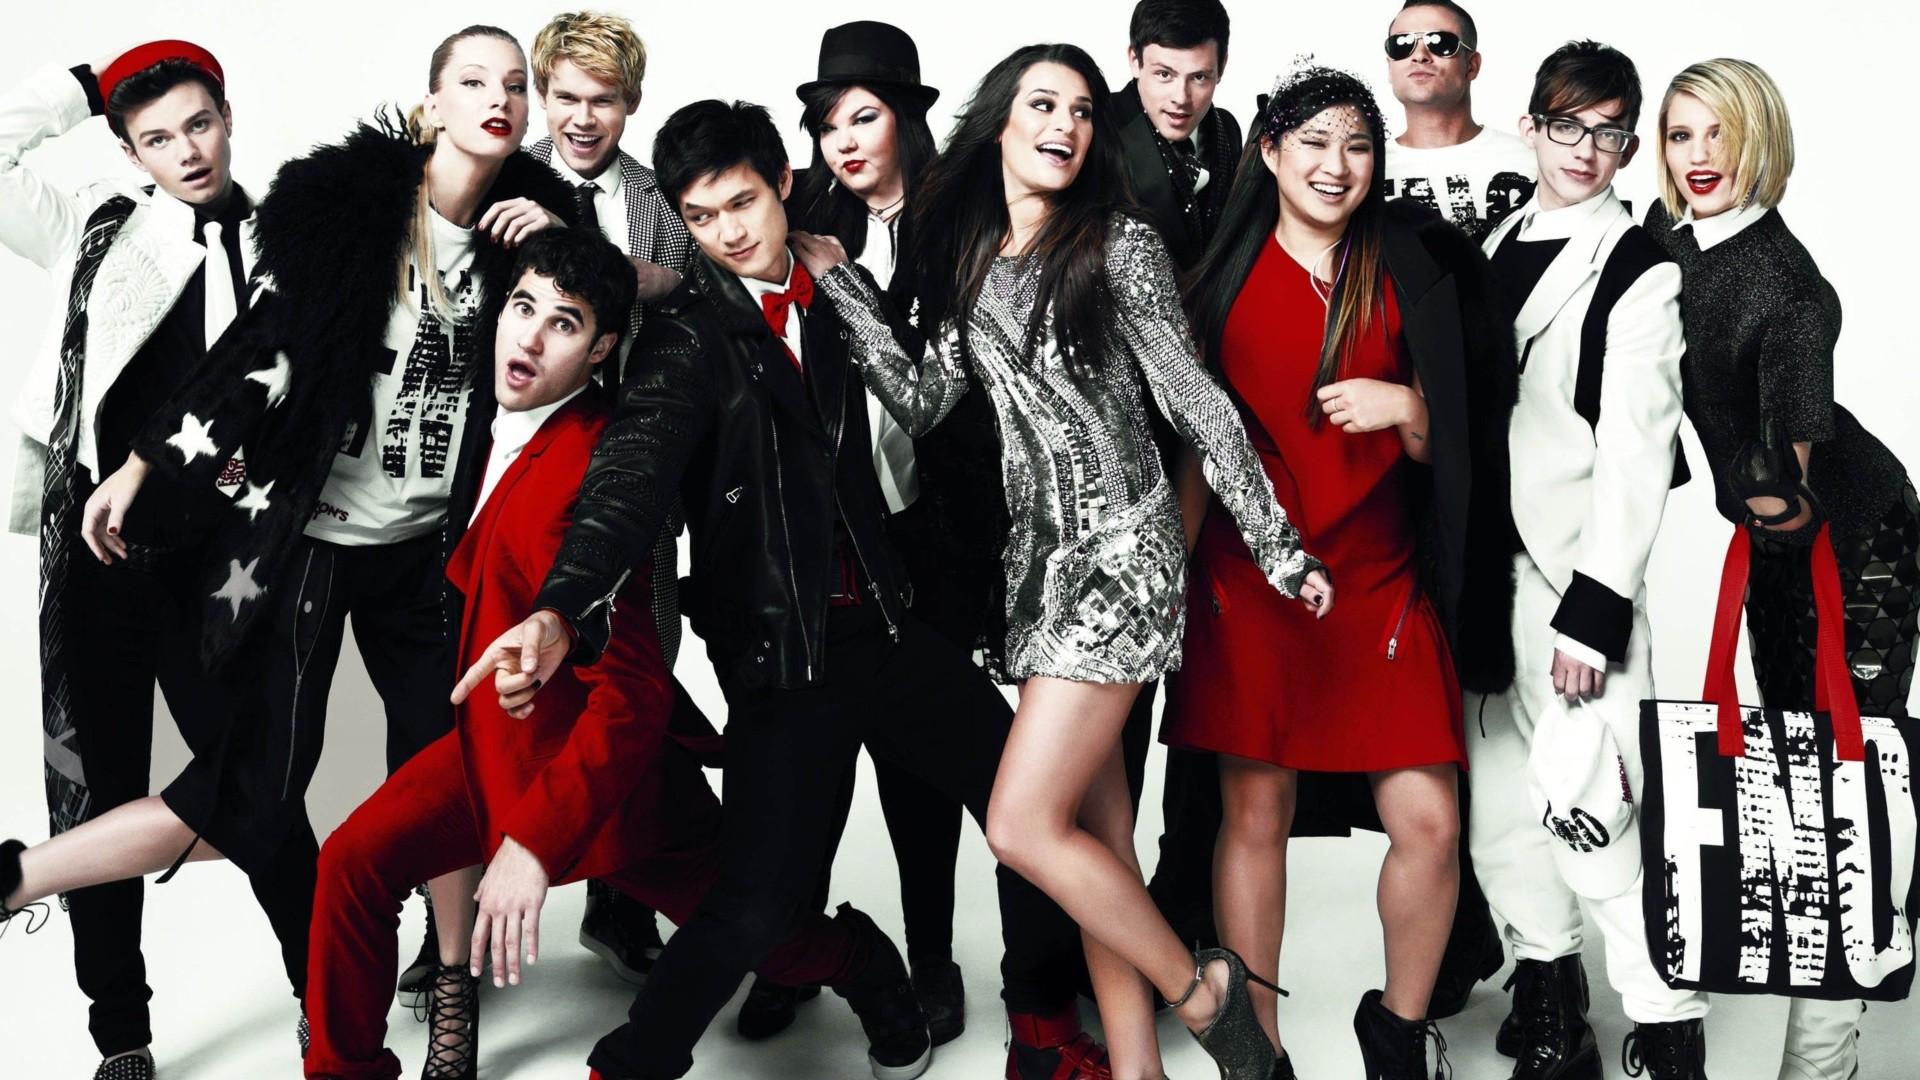 Glee cast backdrop wallpaper